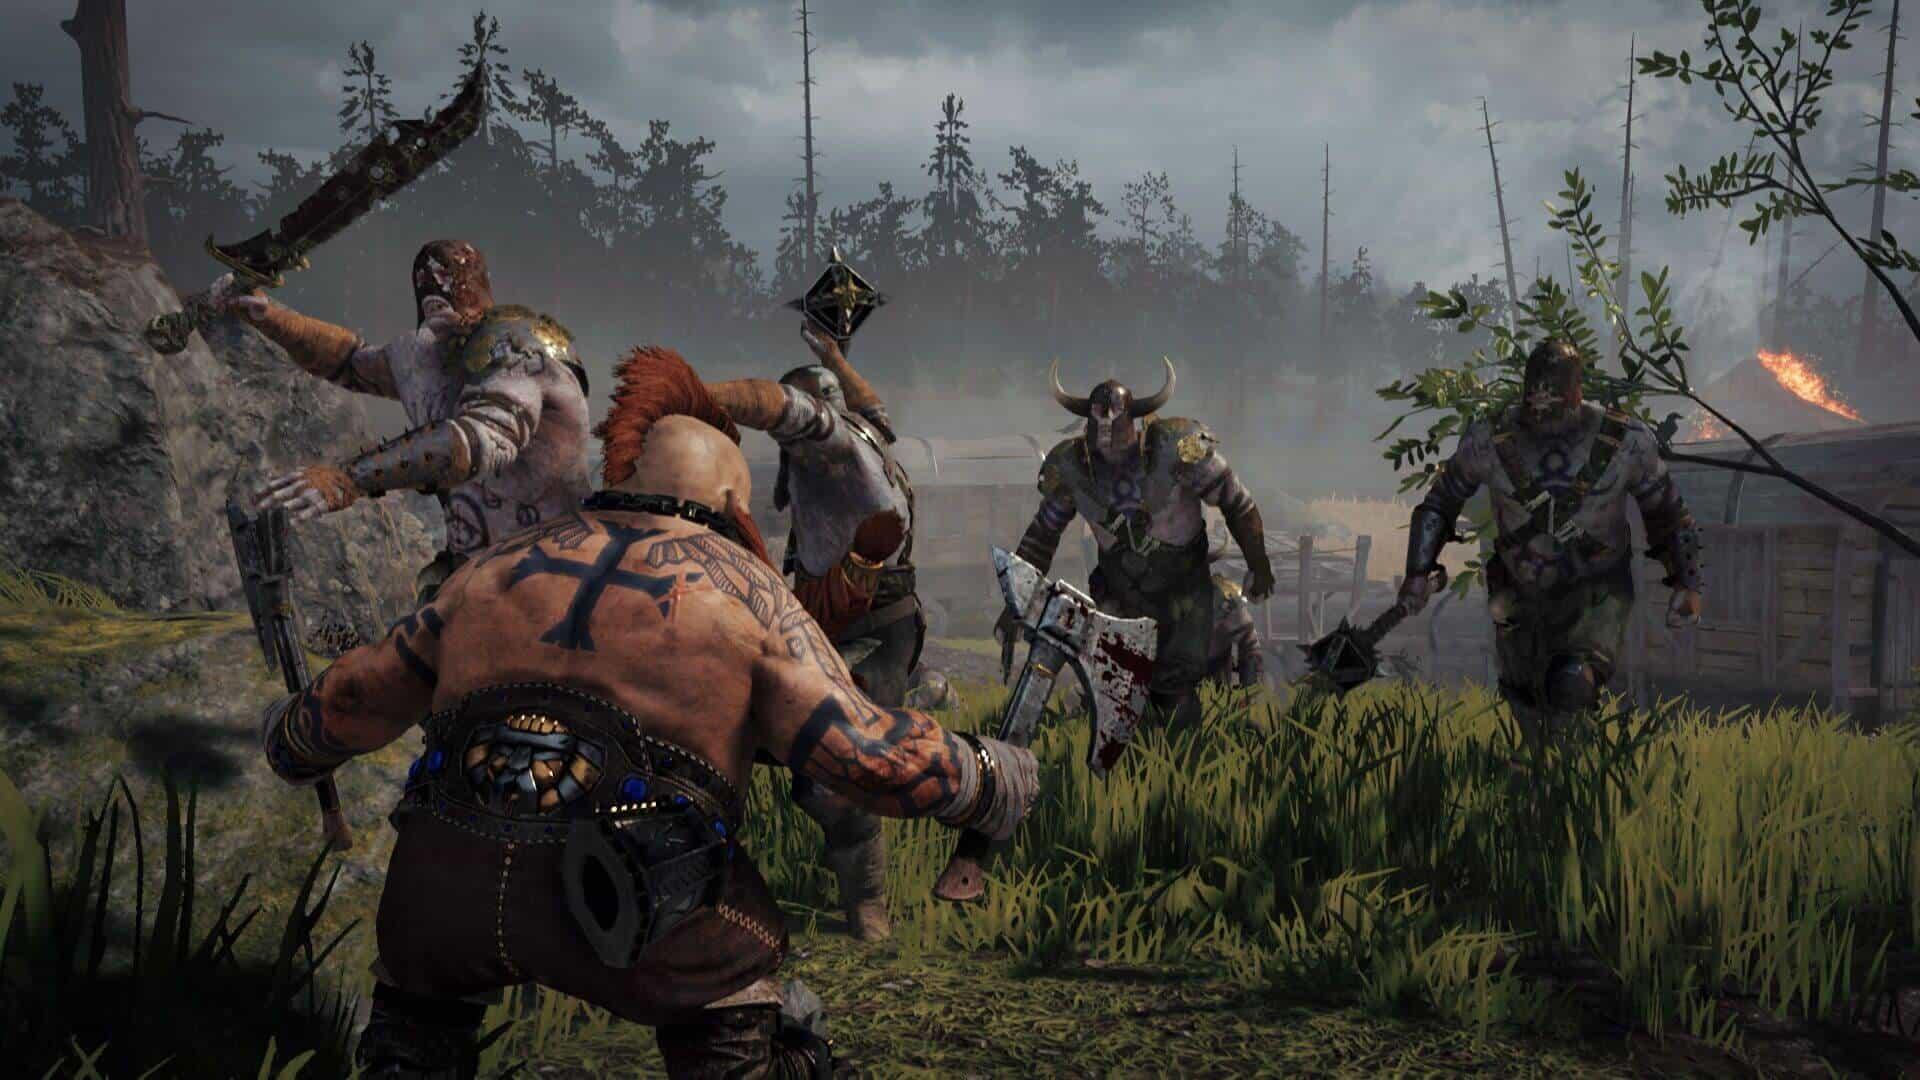 Fatshark Vermintide 2 Screenshot 01 preview 1 - Warhammer: Vermintide 2 supera le 500.000 copie in meno di una settimana